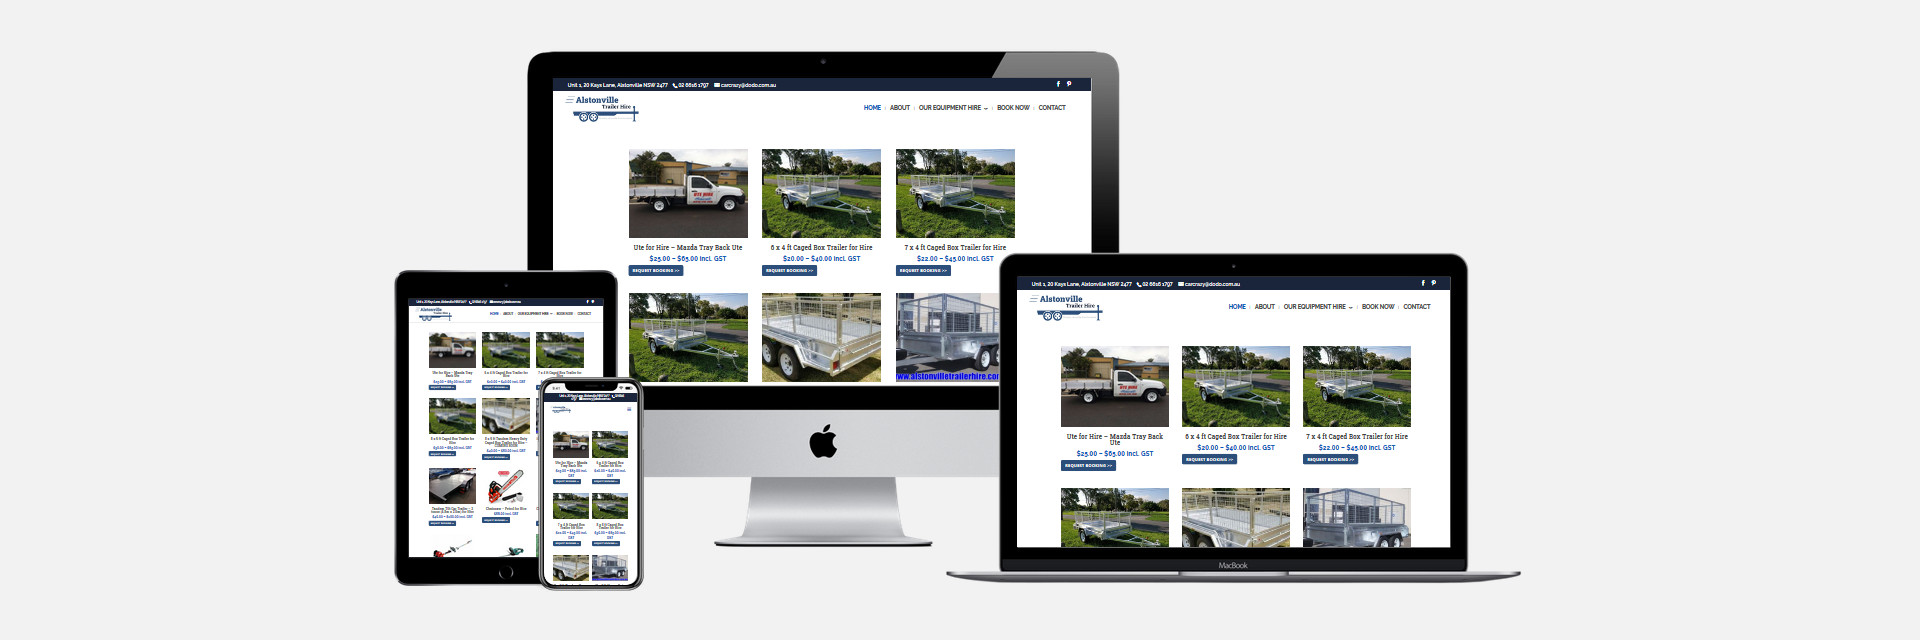 Alstonville Trailer Hire - New Website Design